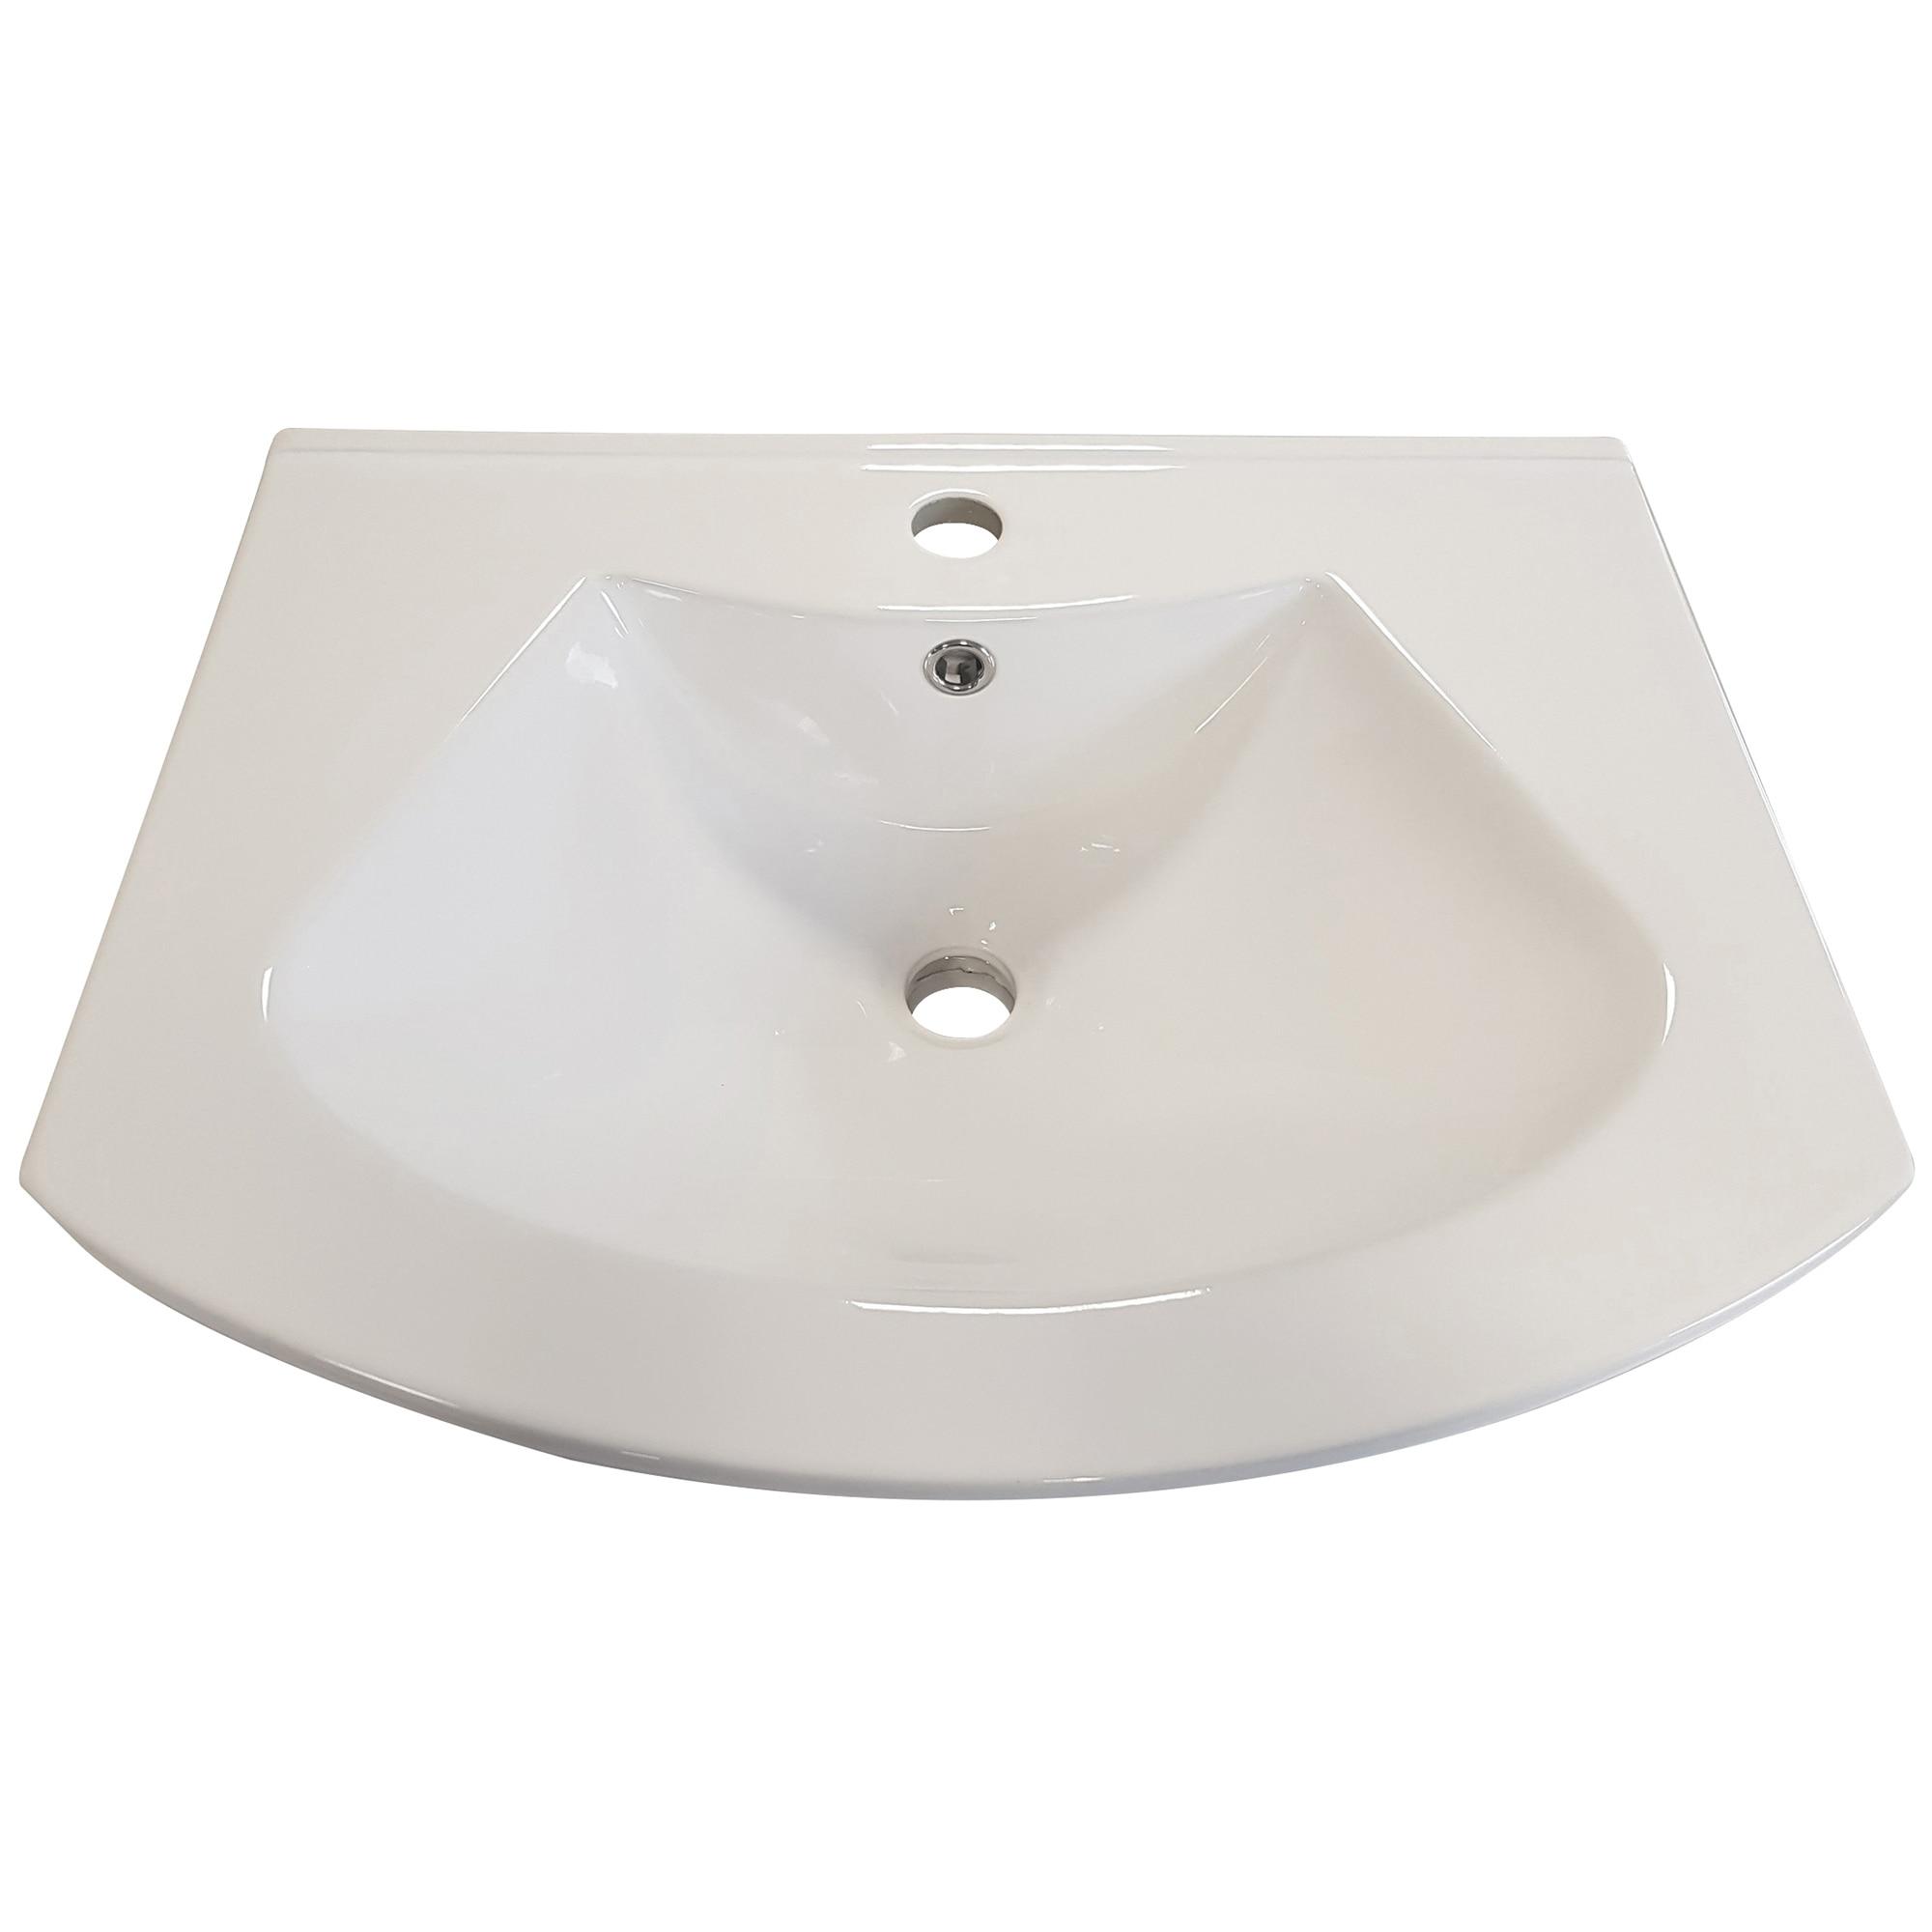 Fotografie Lavoar ceramic Kring Luna, alb, 62x18x49 cm